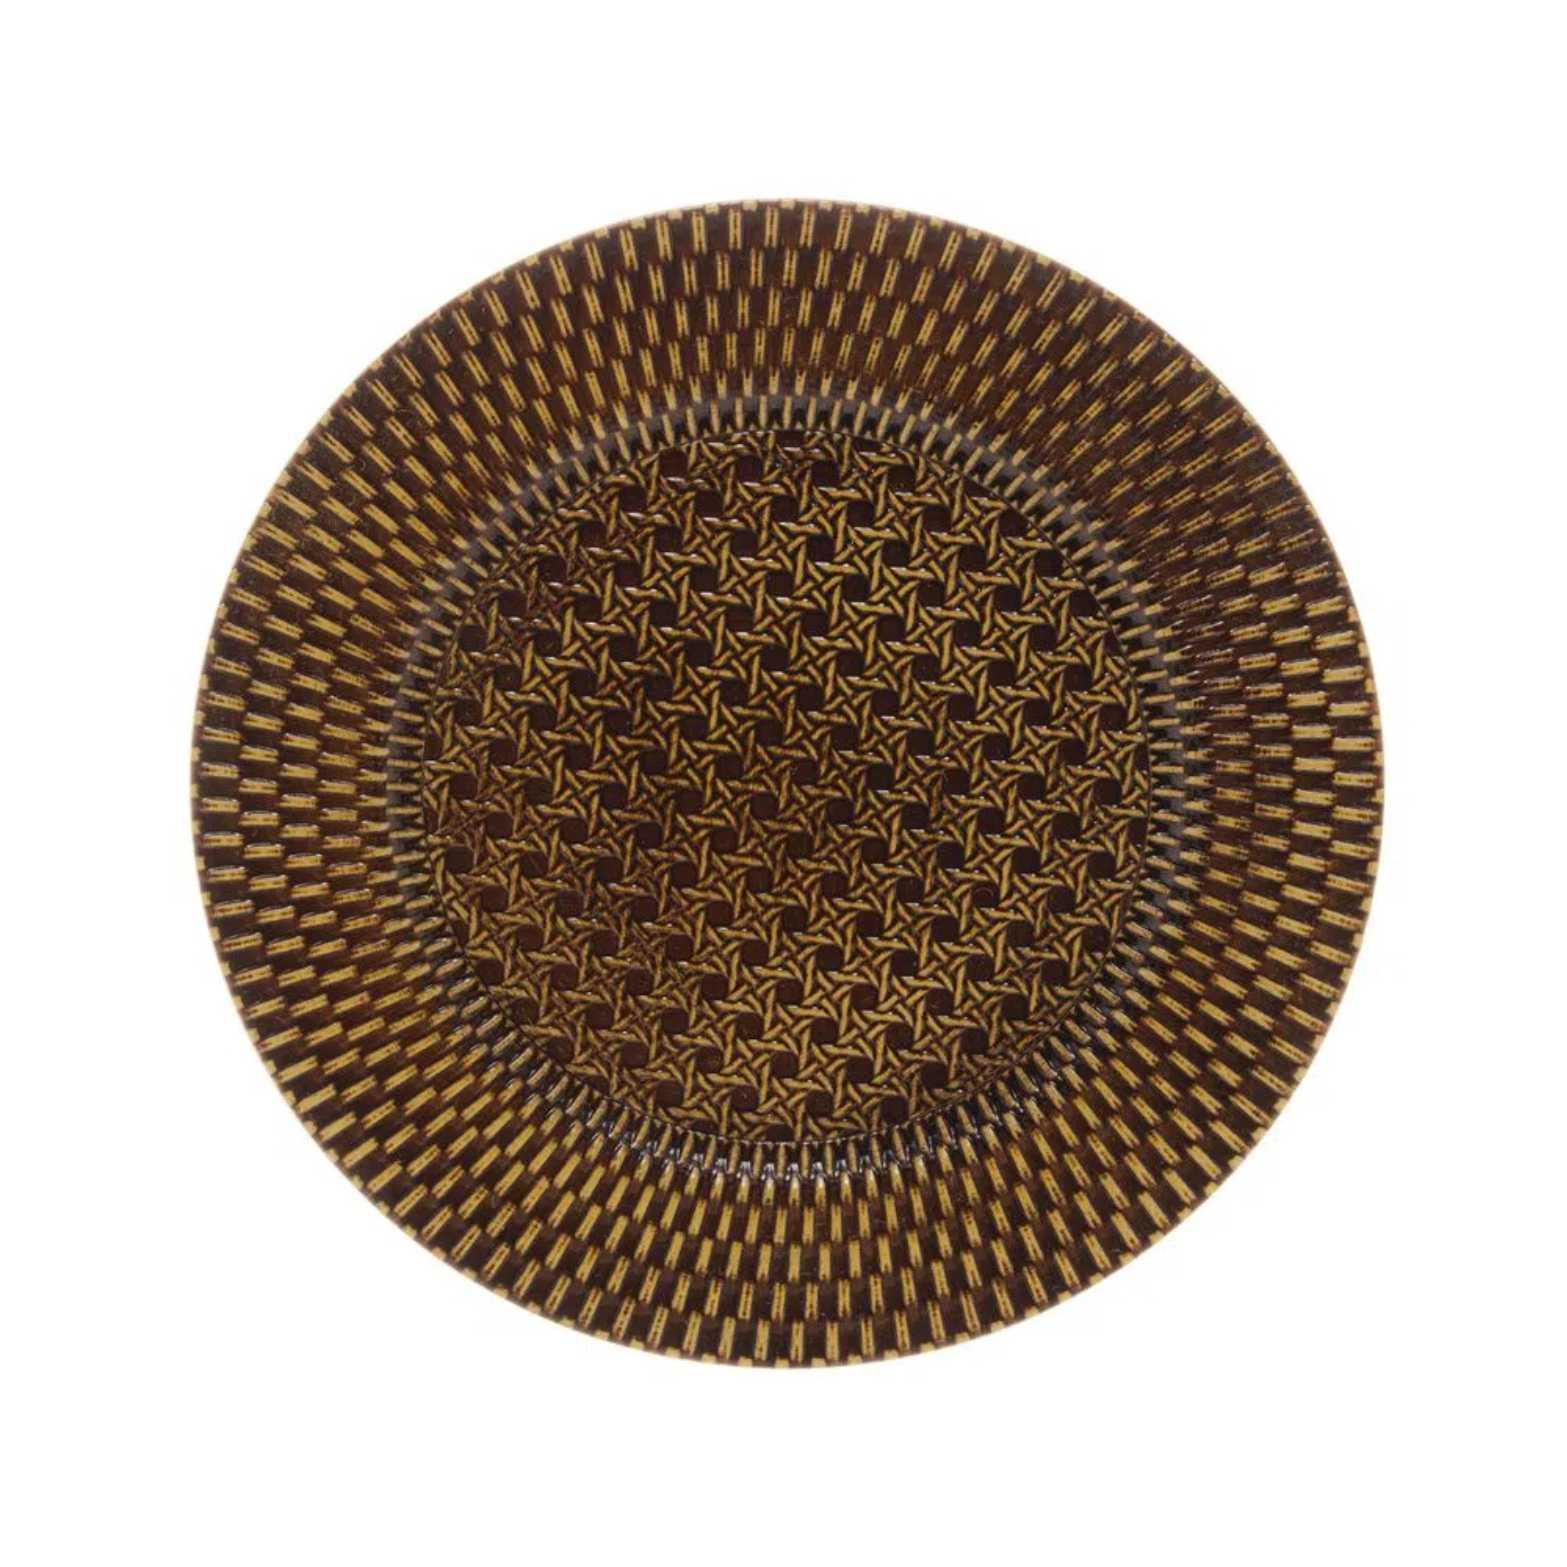 Sousplat Textura Rattan Natural Castanho em Polipropileno 33CM - Royal